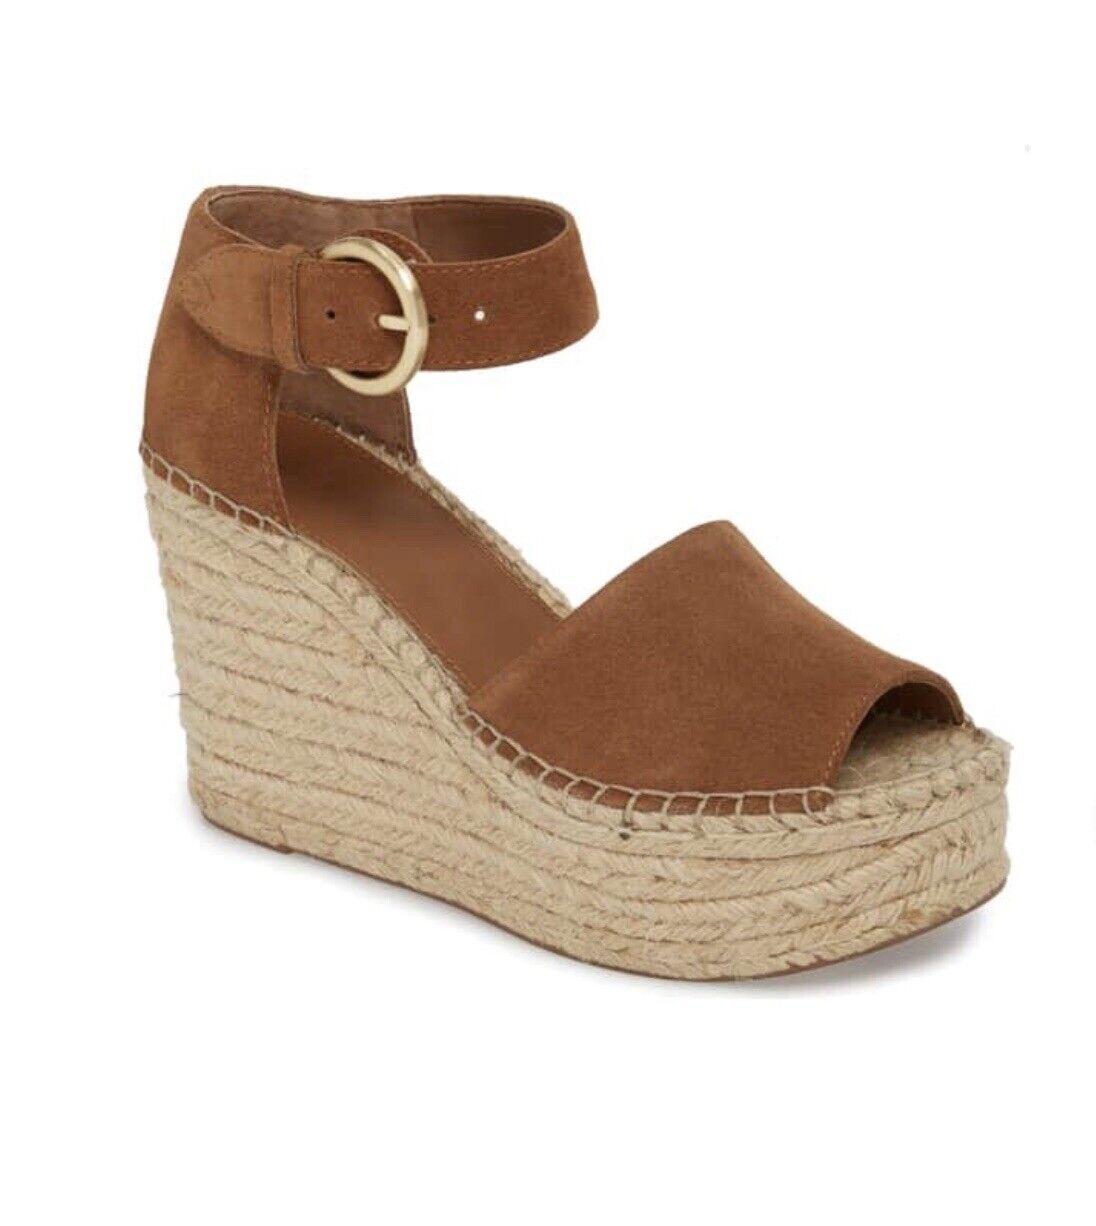 Marc Fisher LTD ALIDA Platform Wedge Cognac Sandals Dimensione 8.5